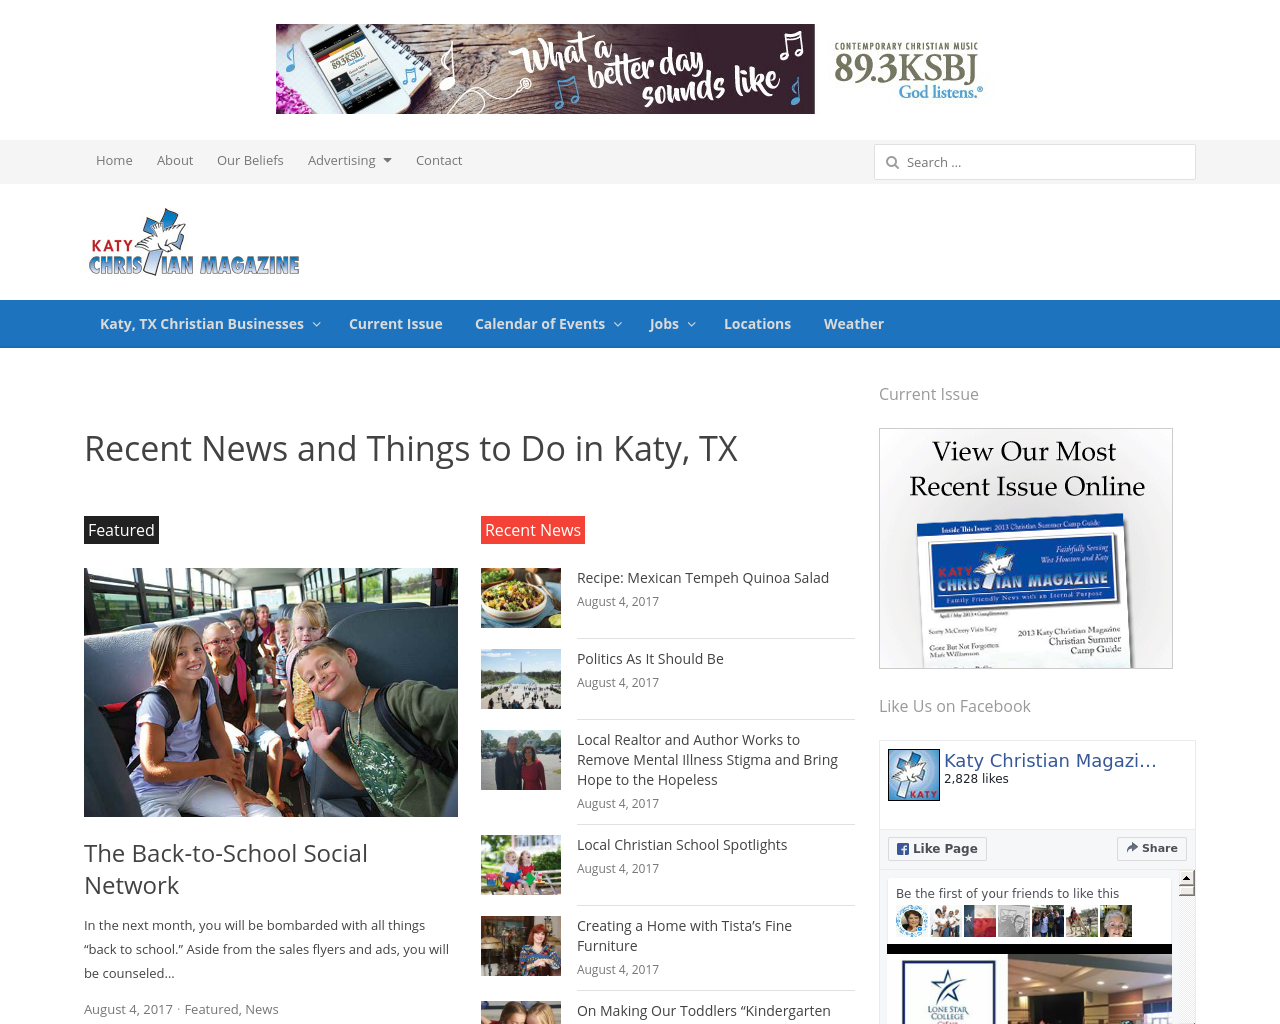 Katy-Christian-Magazine-Advertising-Reviews-Pricing